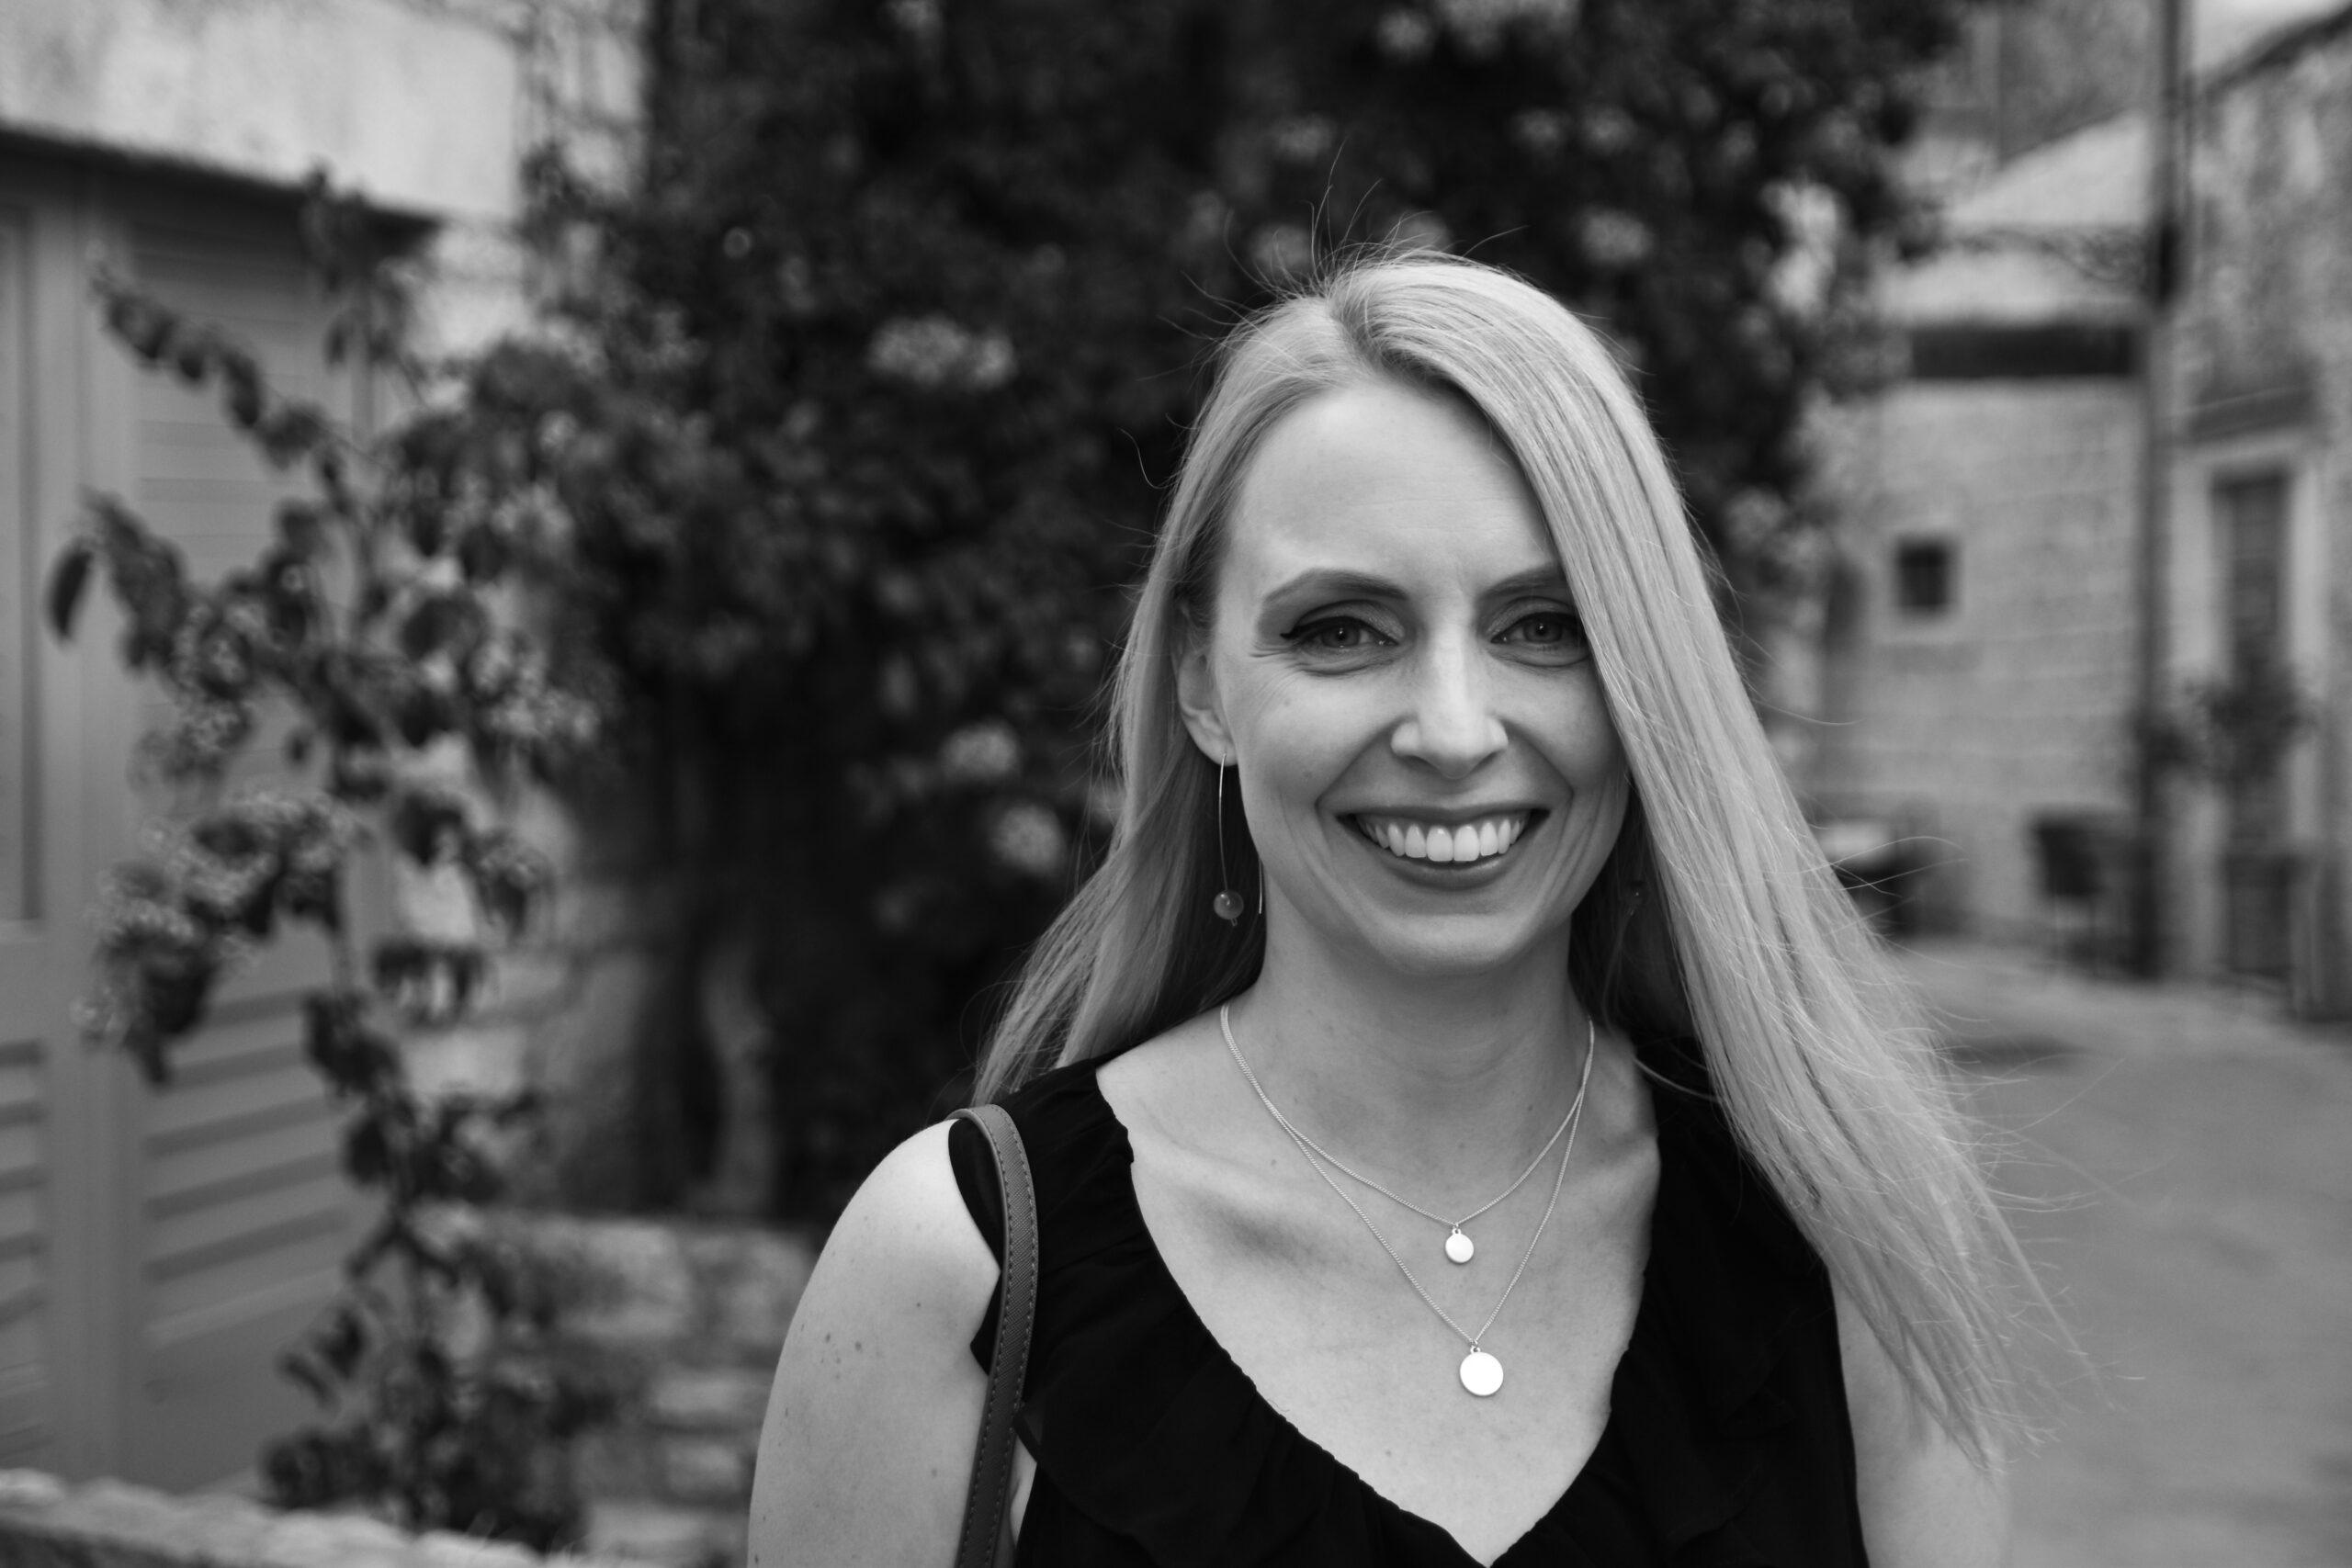 Sonja Švec Španjol: Banalnost je prevladala i pritom istisnula kulturu i umjetnost iz medija